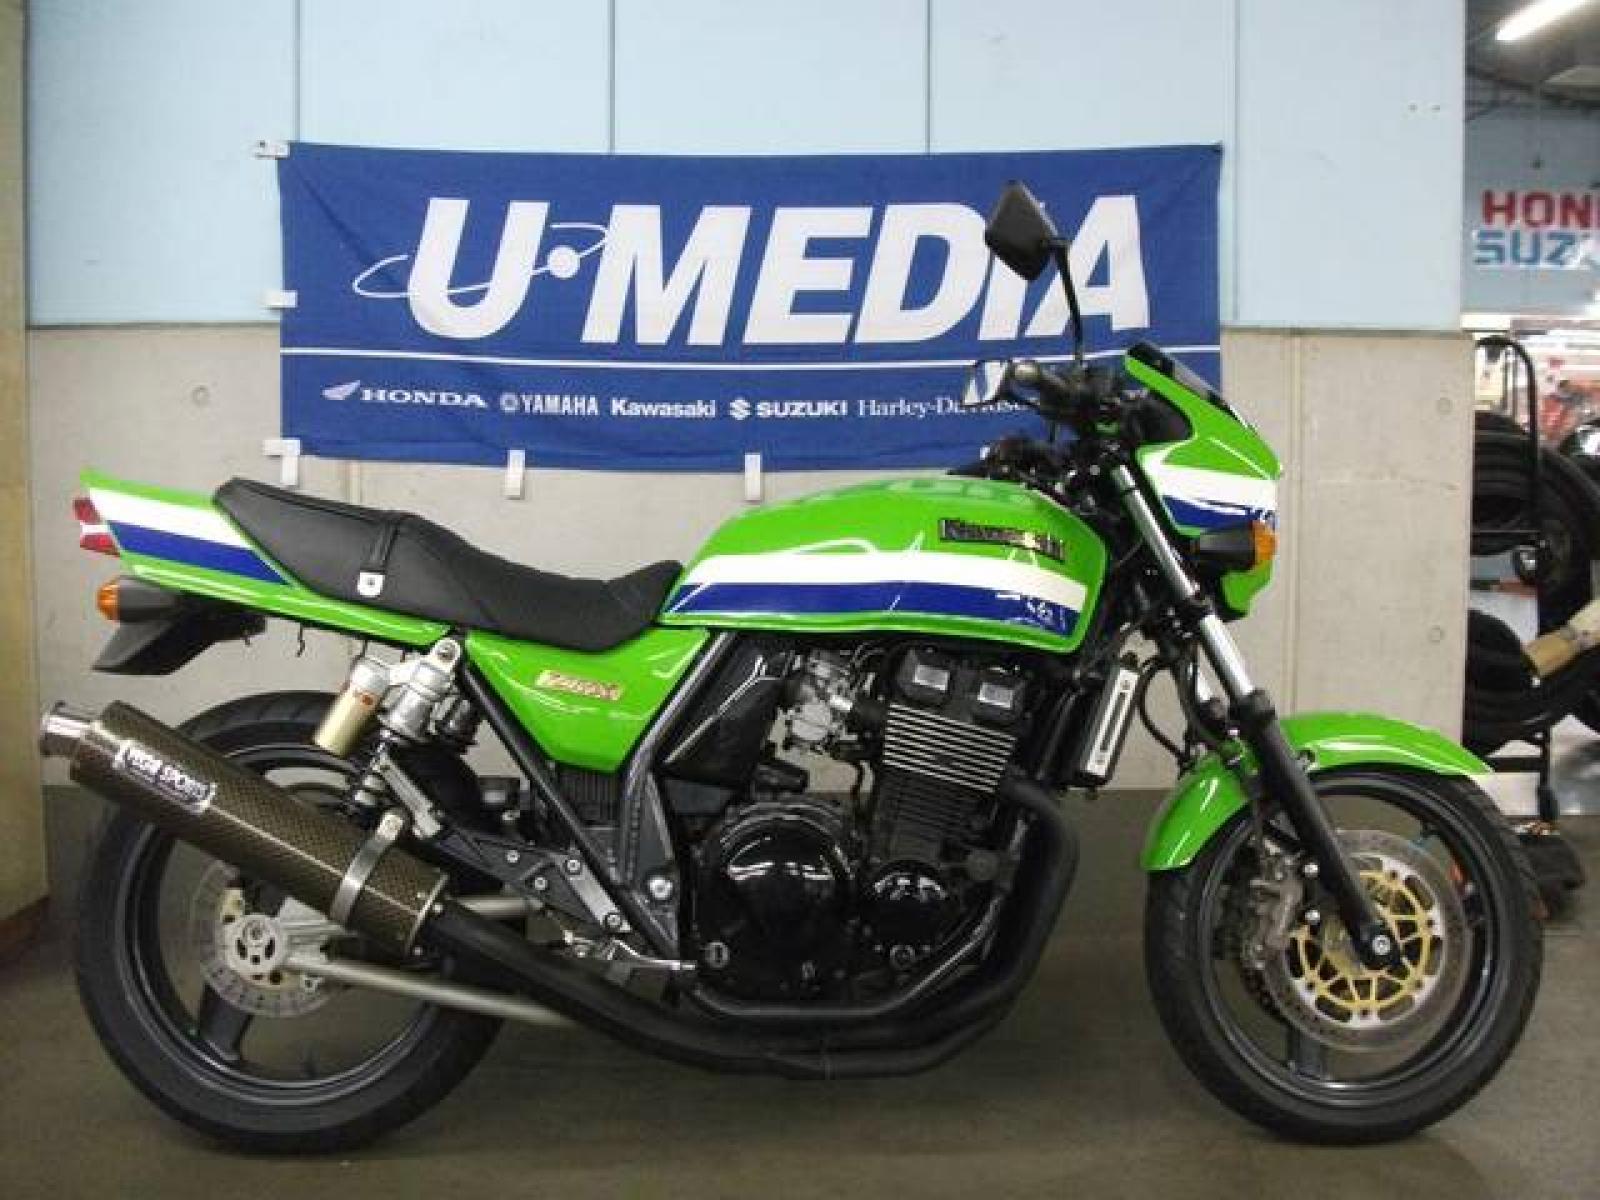 Kawasaki ZRX 400 (ZR 400)